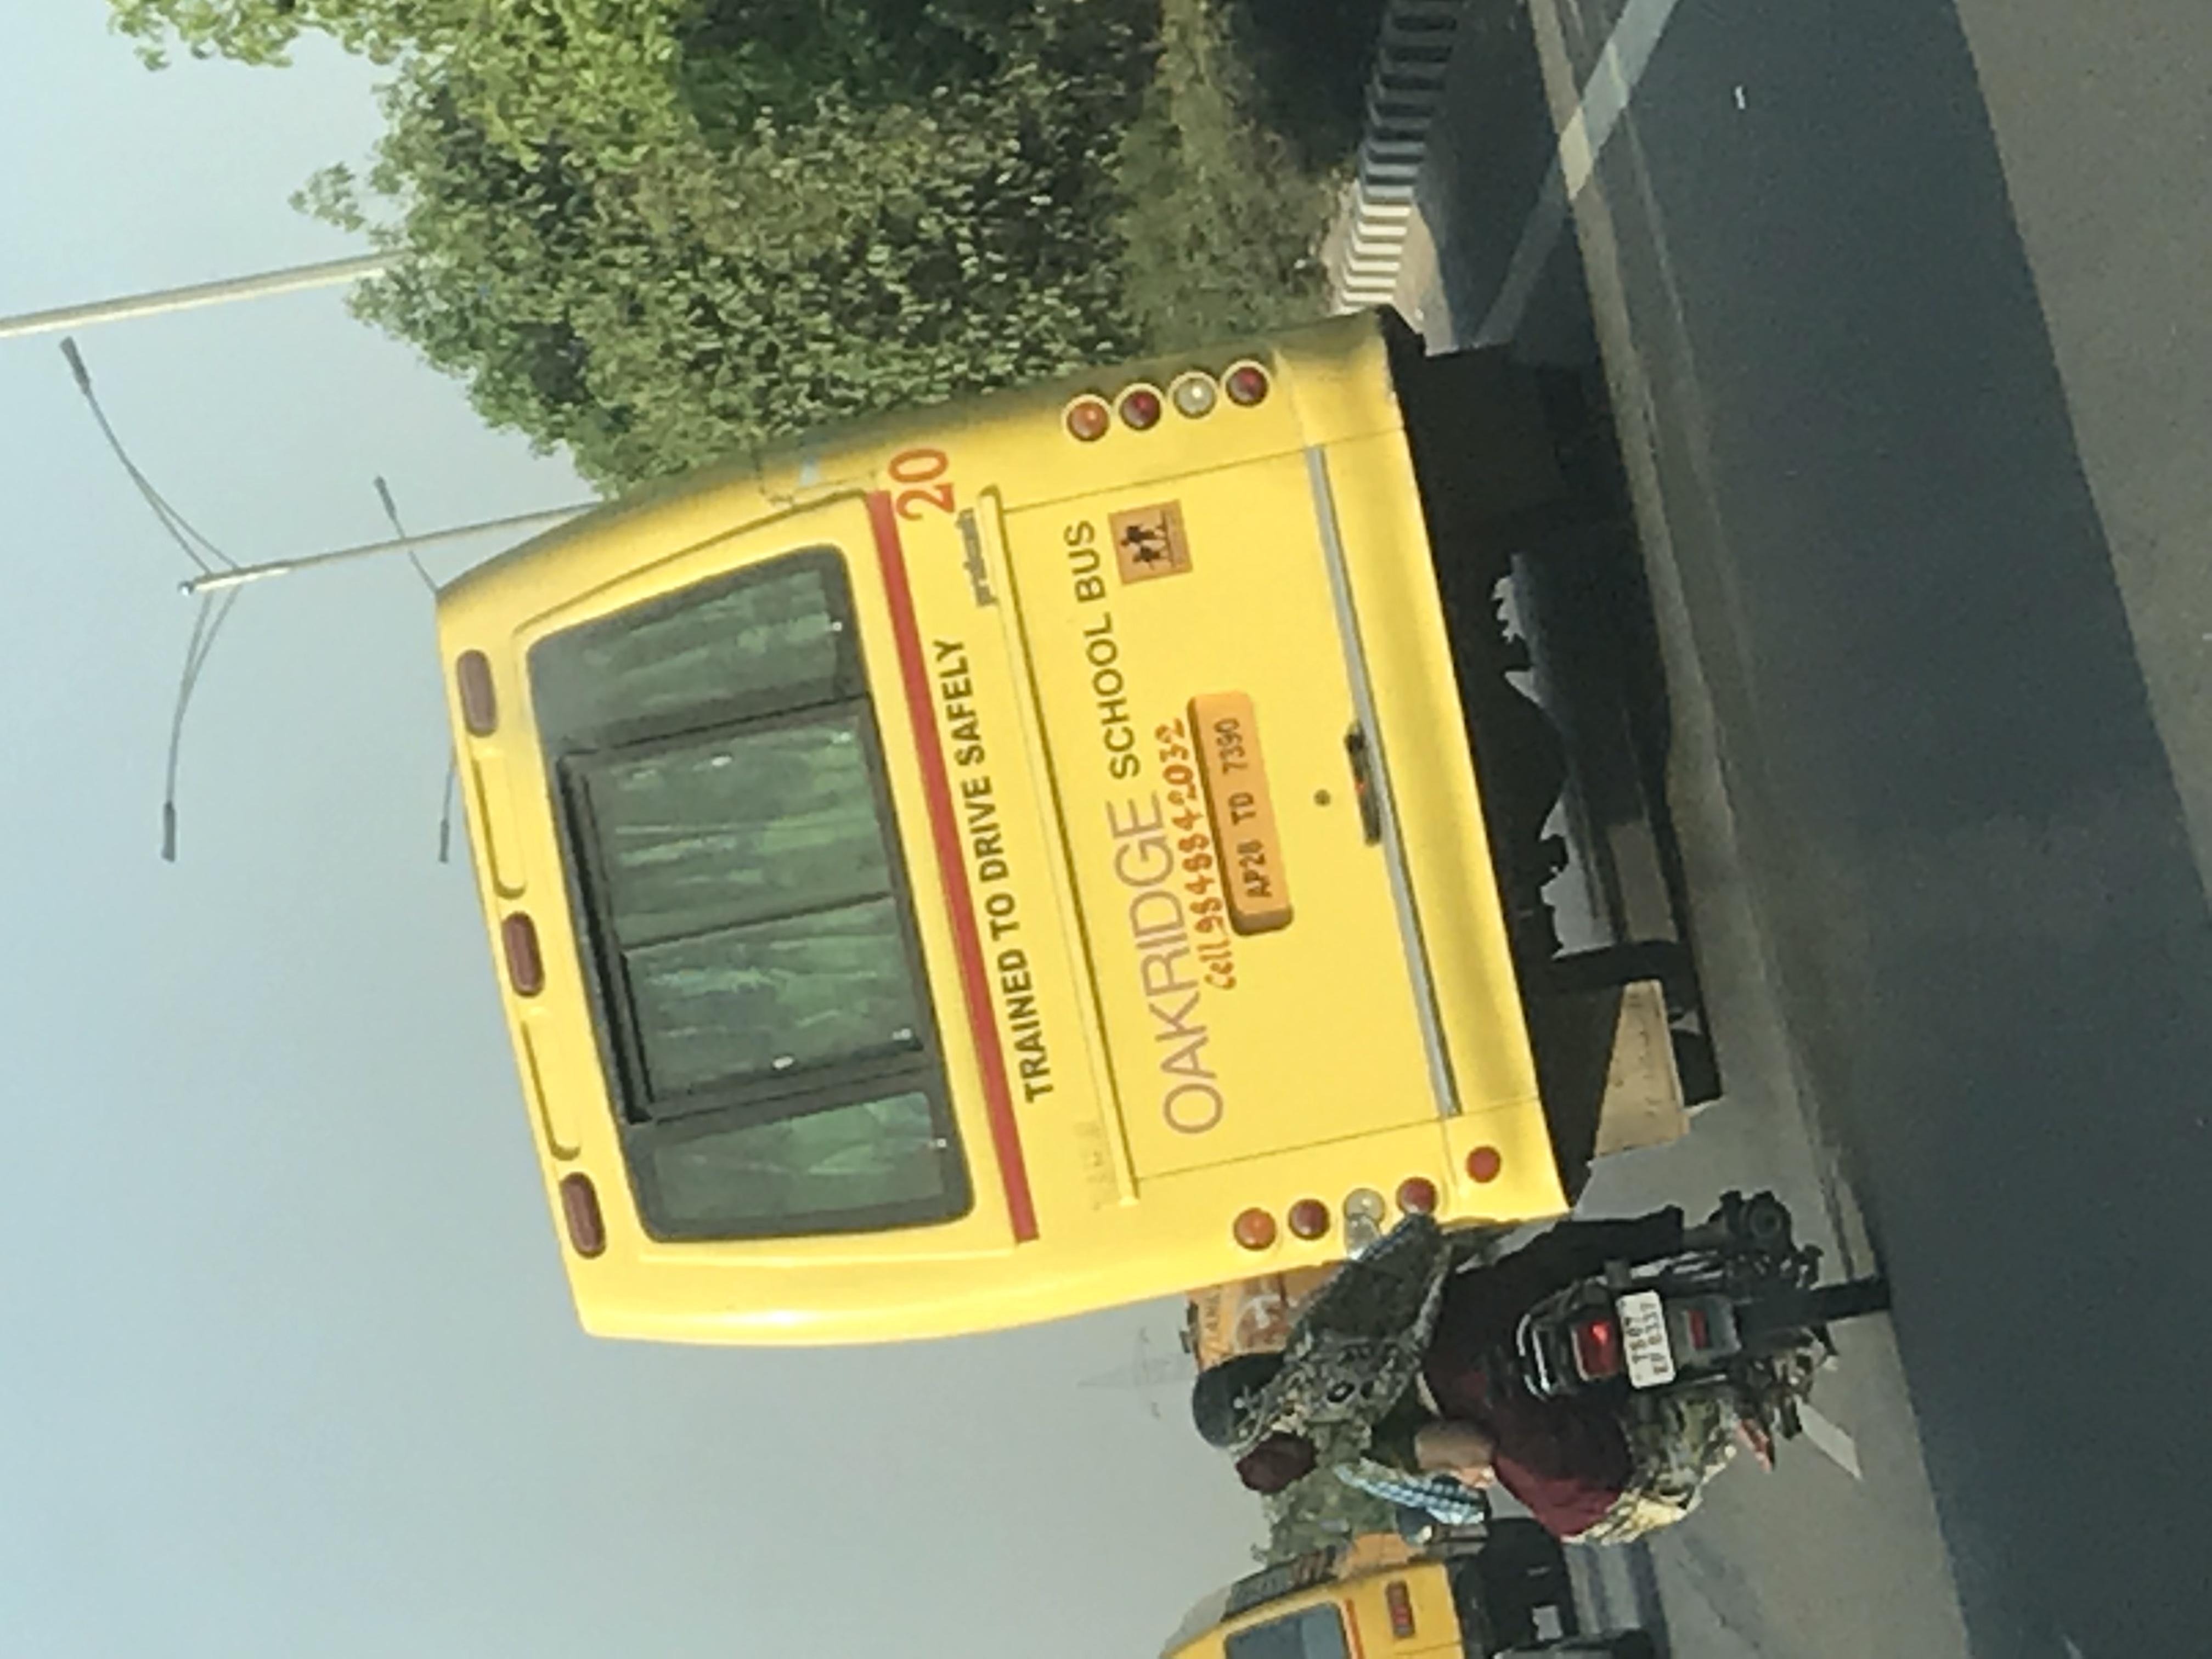 School bus driver was driving rashly  - OAKRIDGE